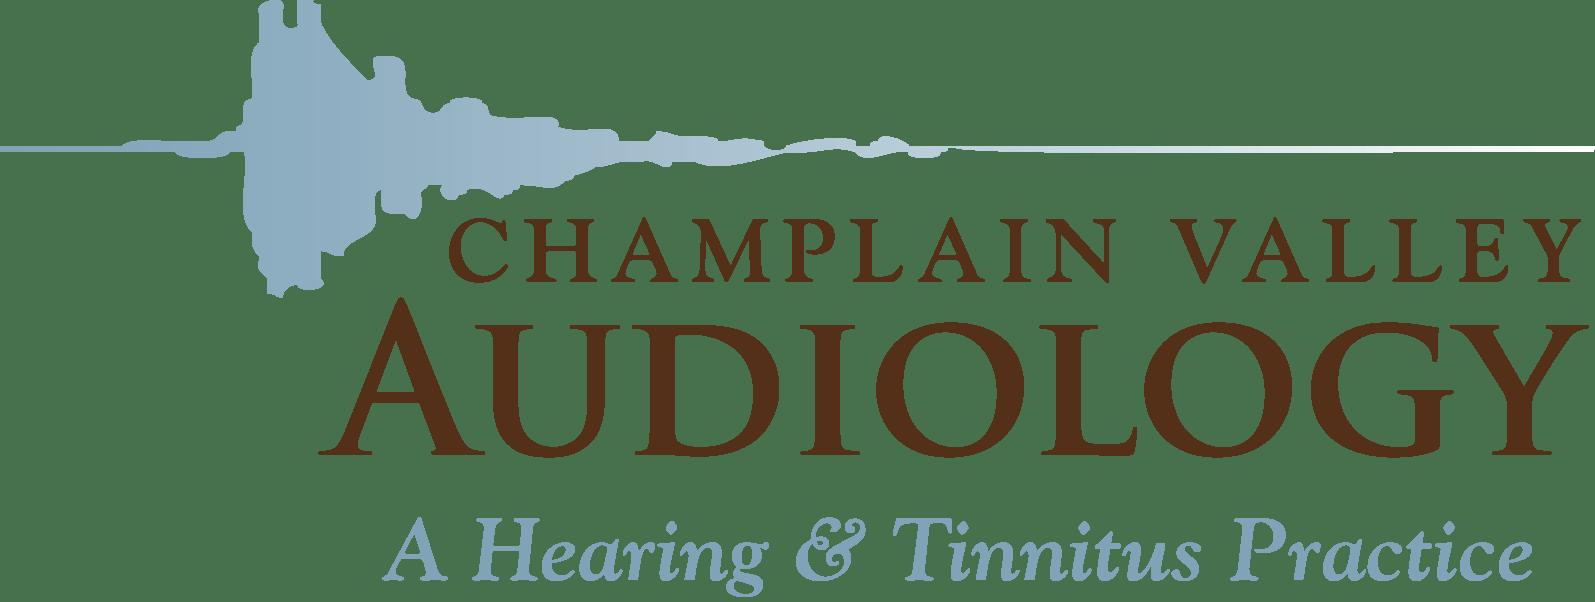 Champlain Valley Audiology Logo